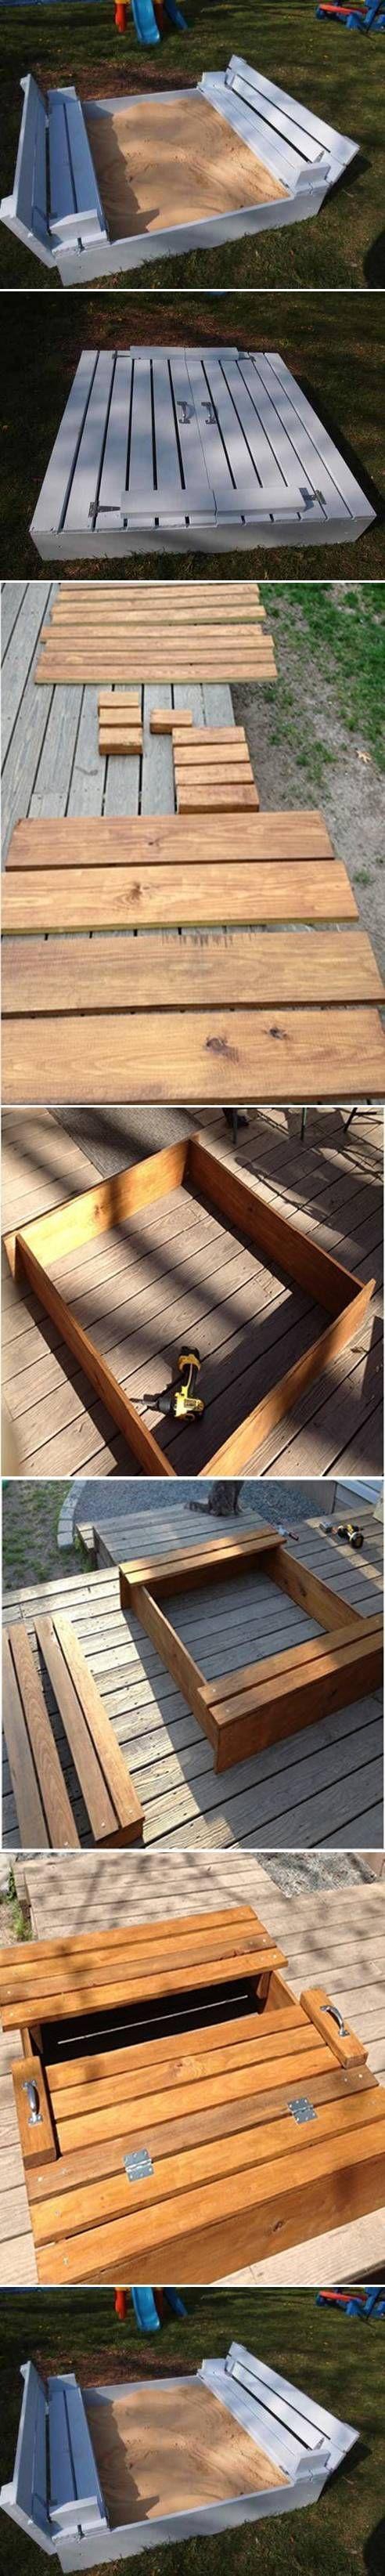 DIY sandbox with lid. It is super cute. :)